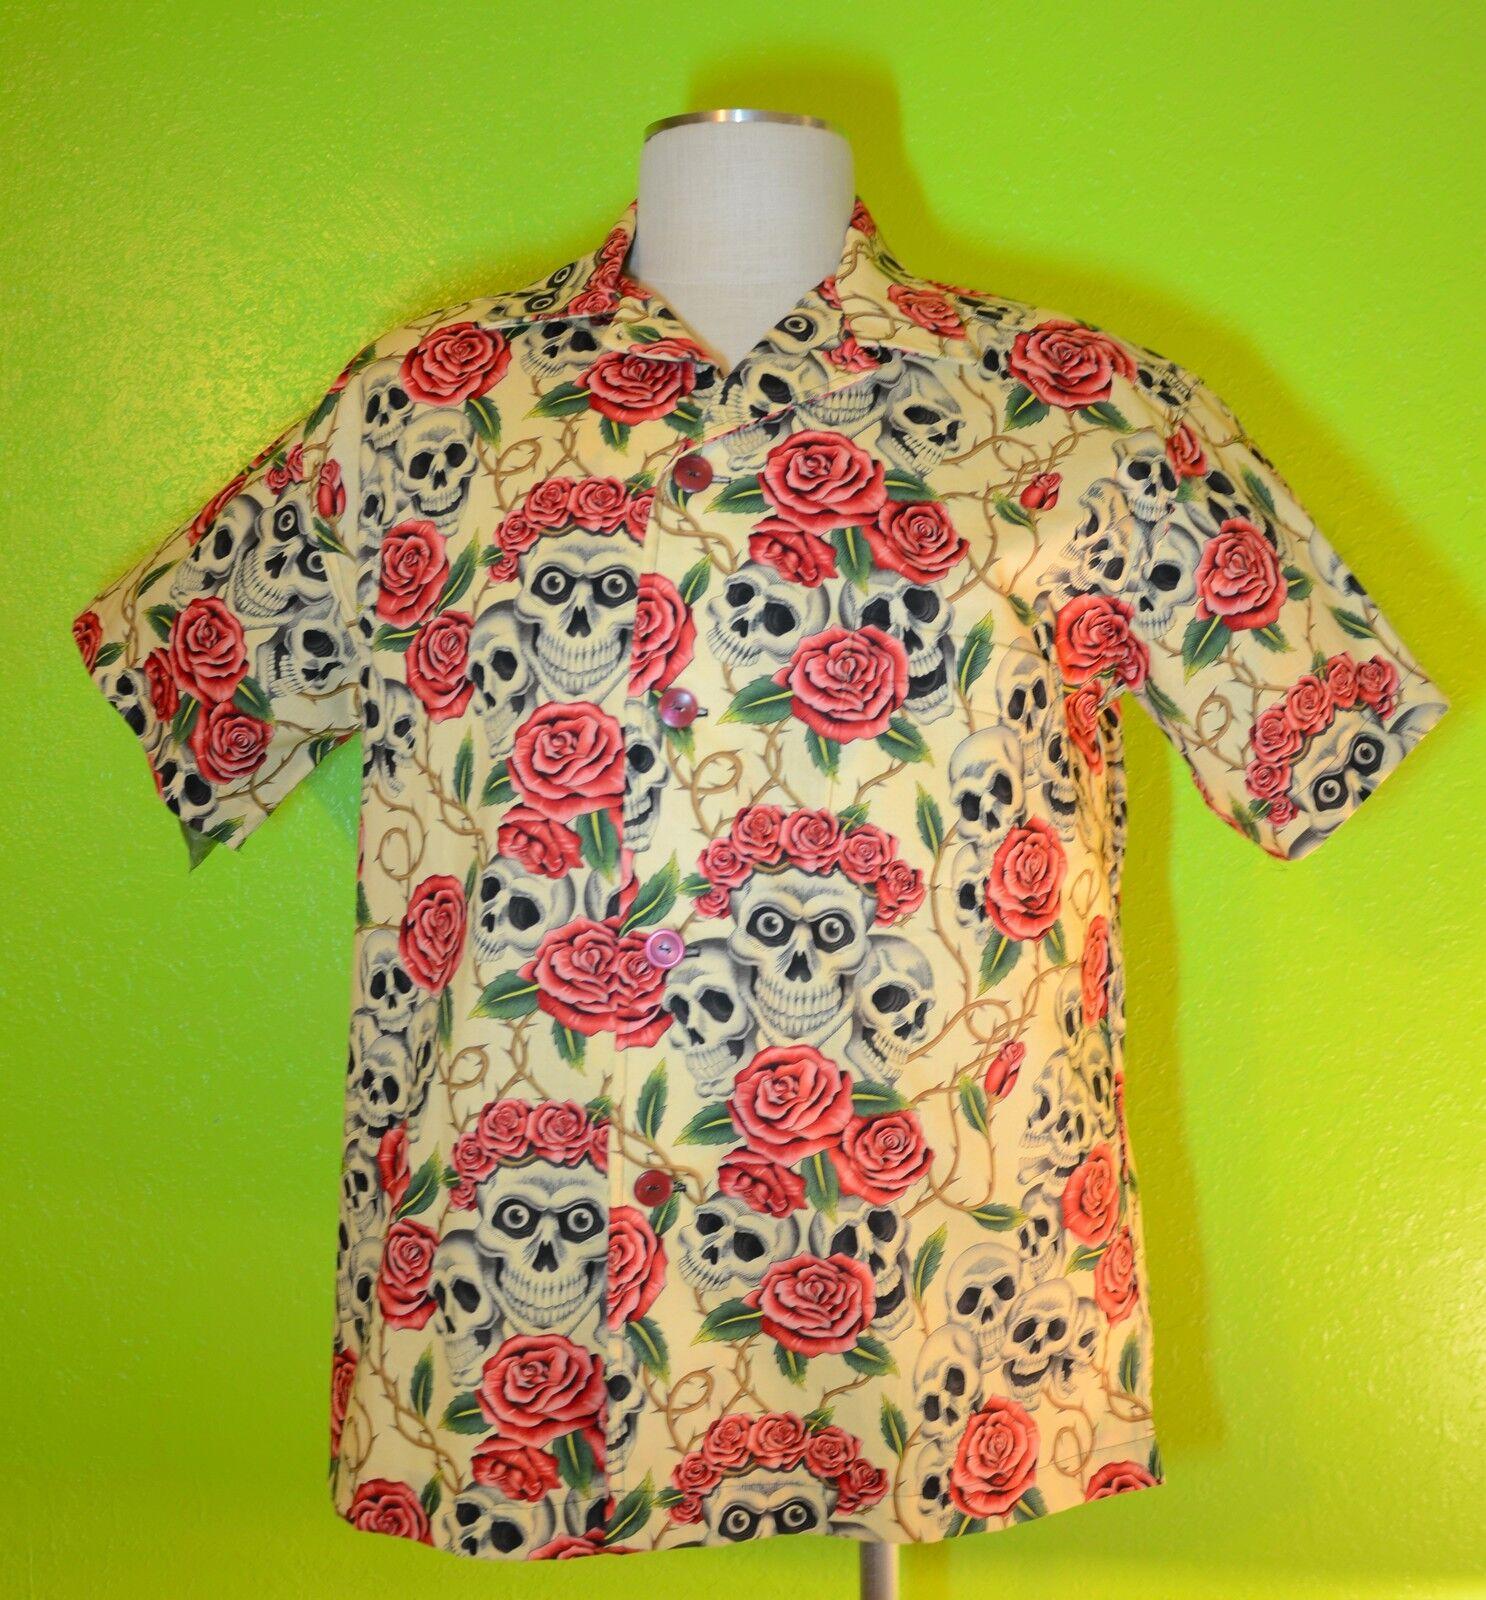 Skulls & pinks Ivory, SOMETHING FISHY Handmade  Shirt, 2XL, Hawaiian, Tropical